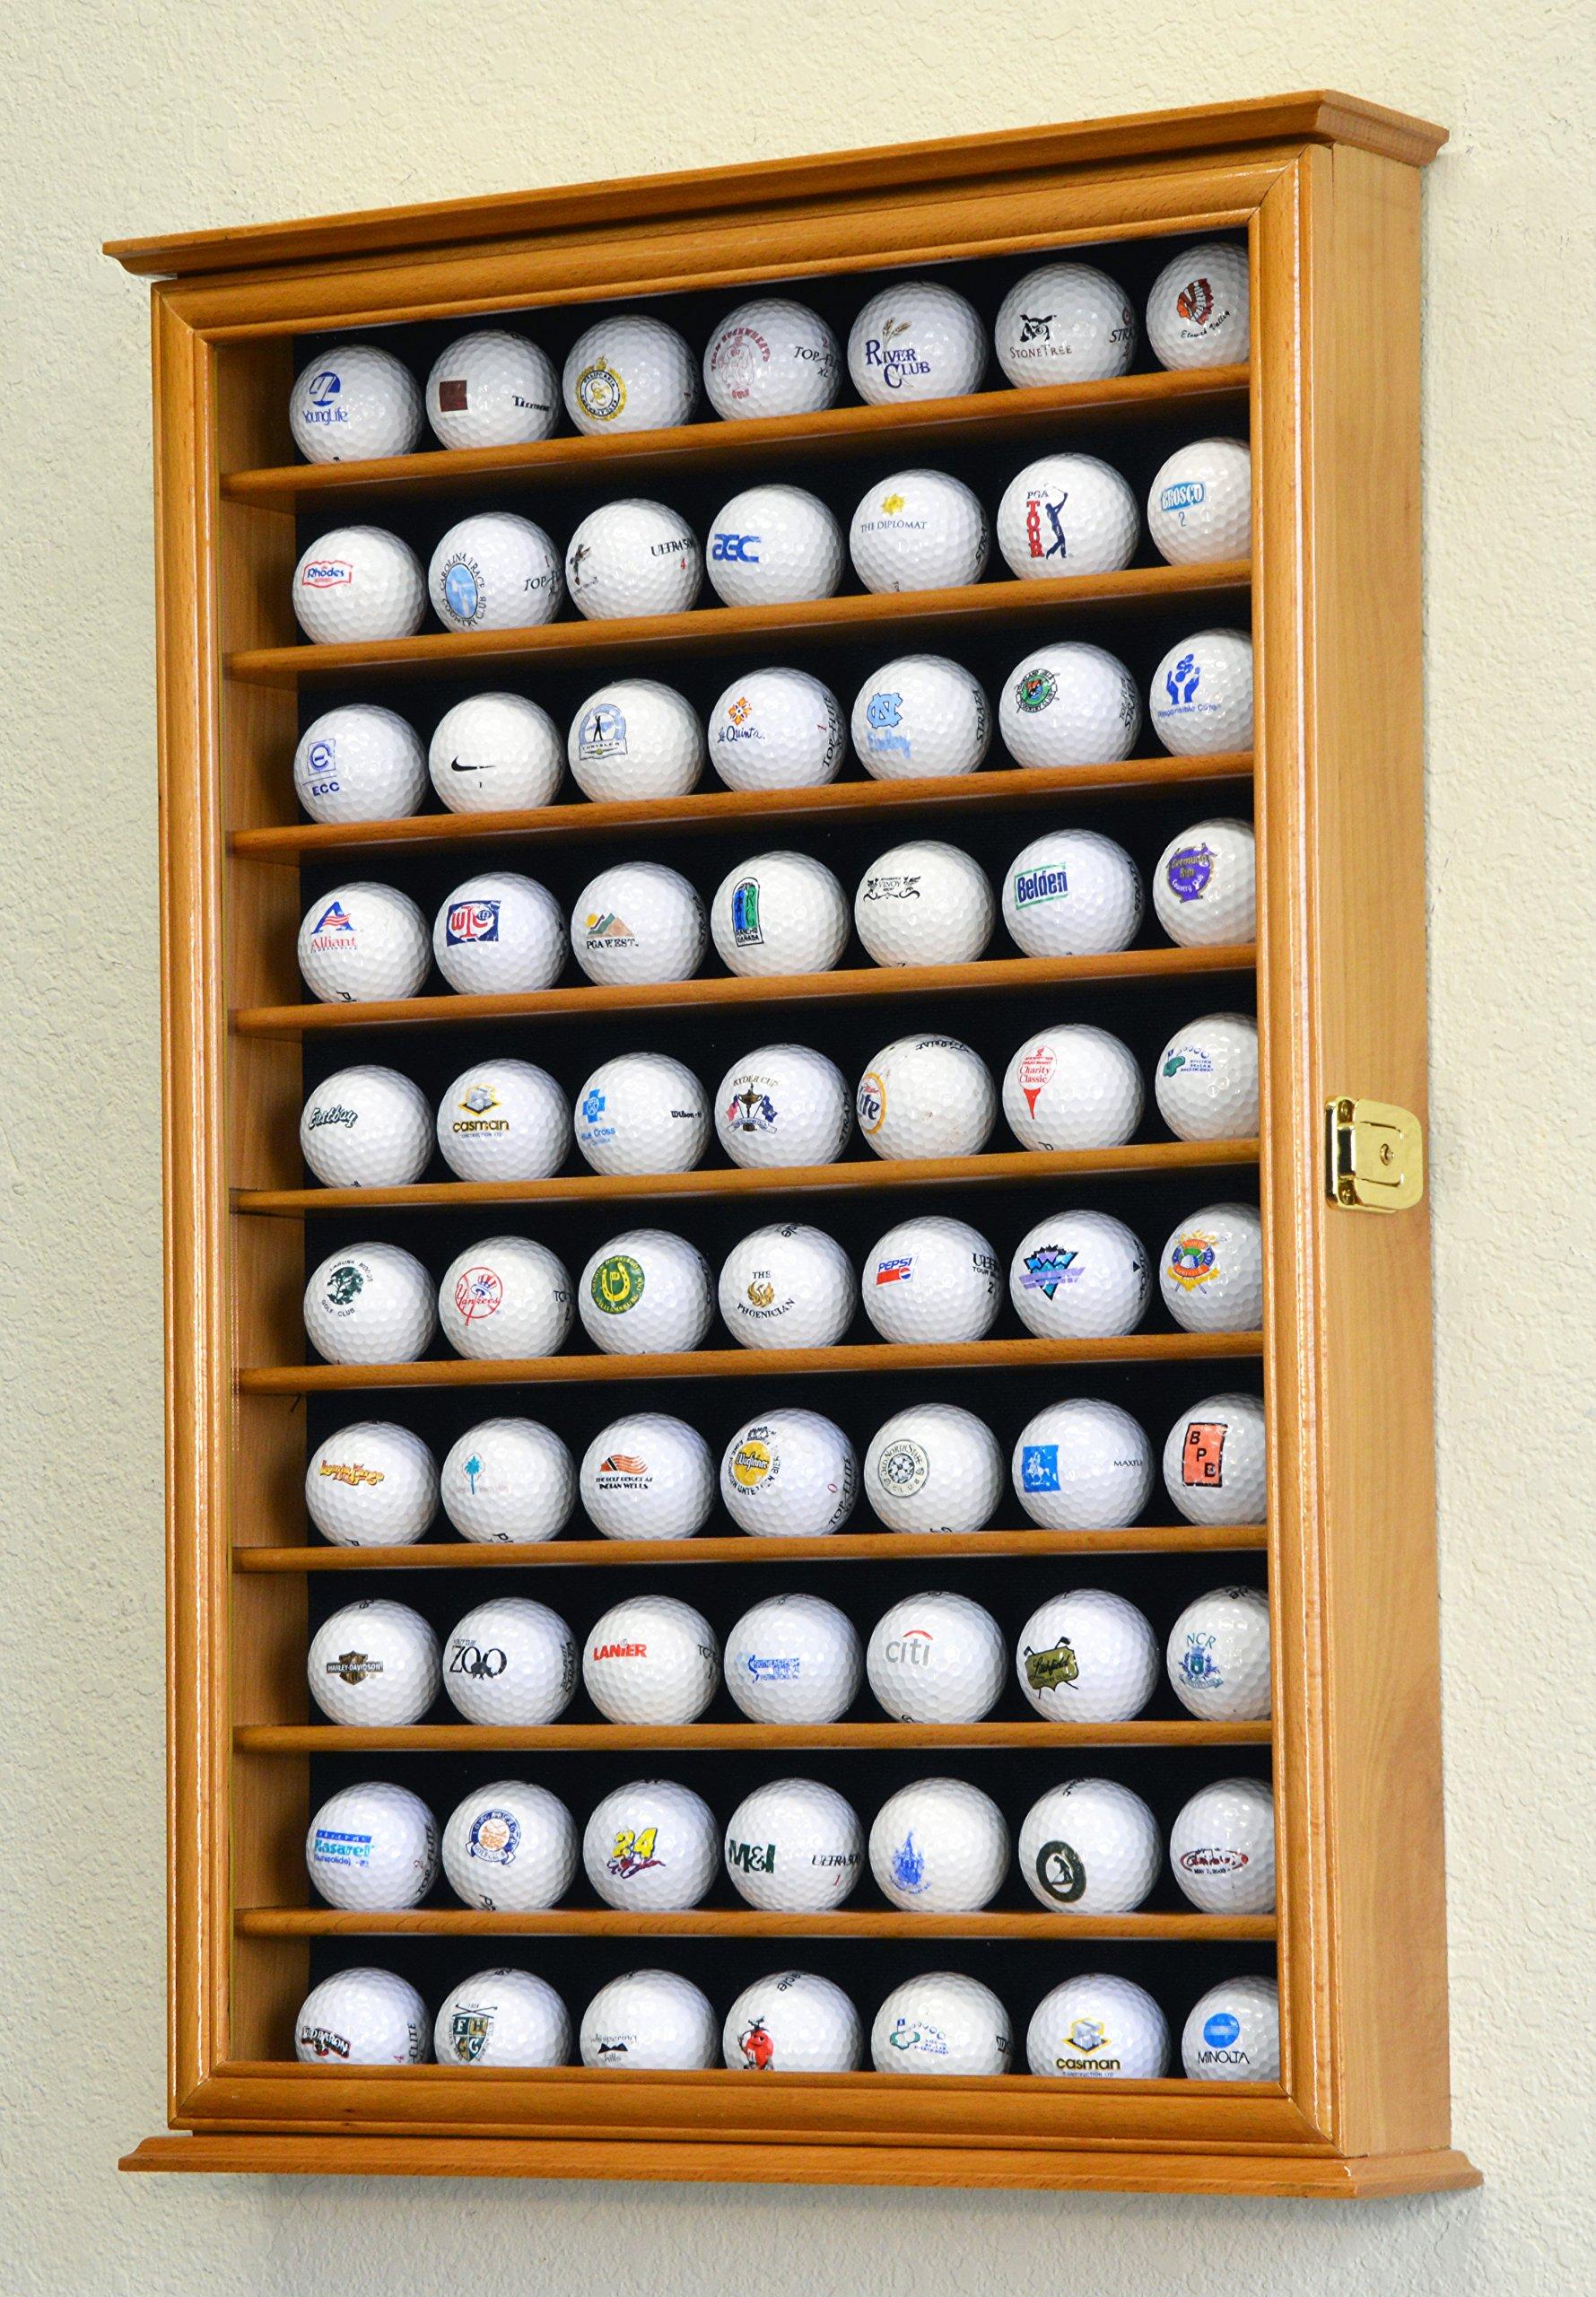 70 Golf Ball Display Case Cabinet Holder Wall Rack w/ UV Protection -Oak